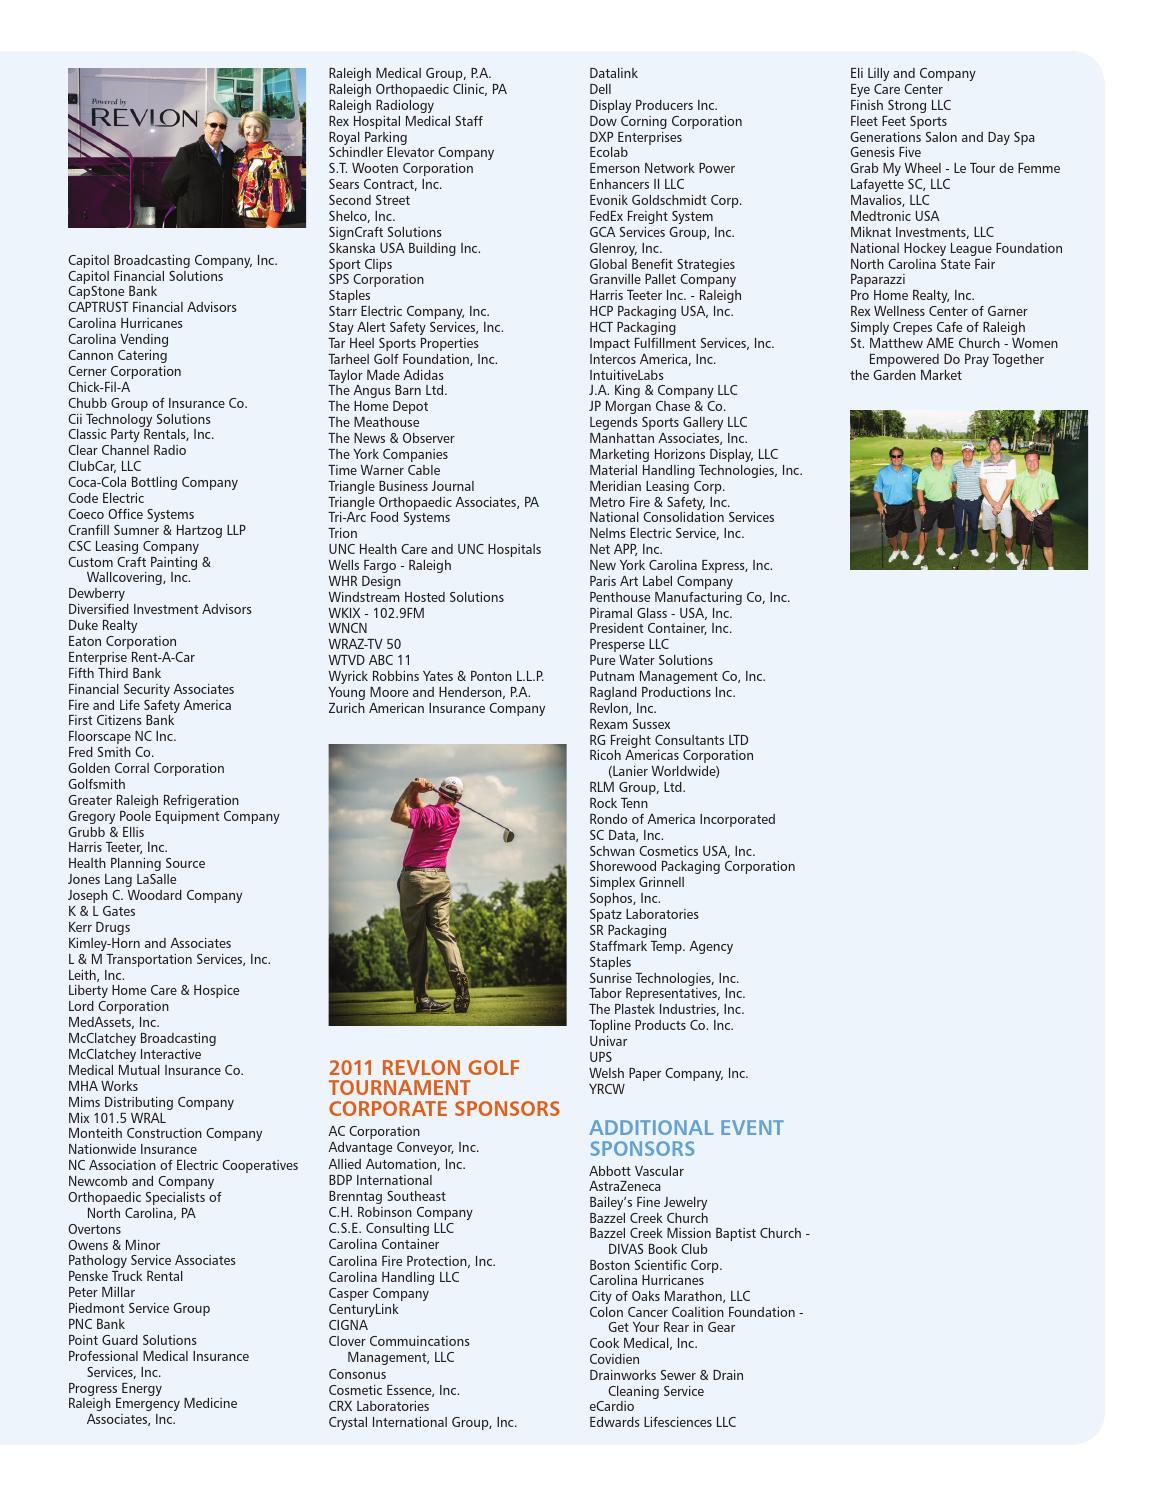 Rex Healthcare Foundation Gratitude Report 20112012 By Sally Johns